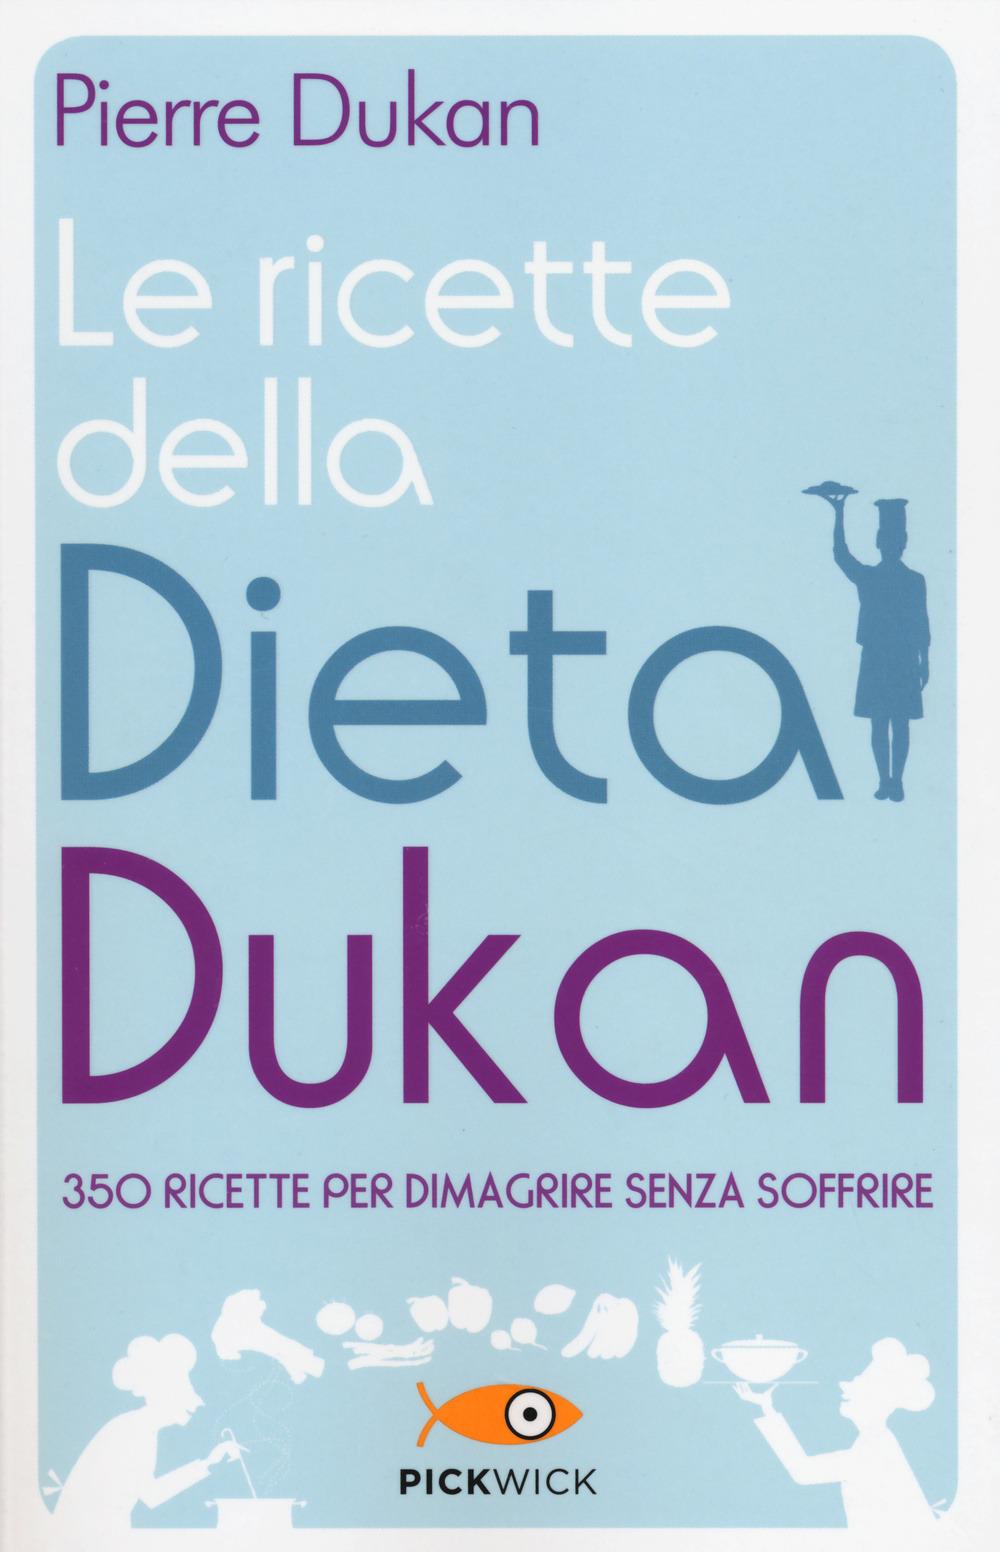 Image of Le ricette della dieta Dukan. 350 ricette per dimagrire senza soffrire